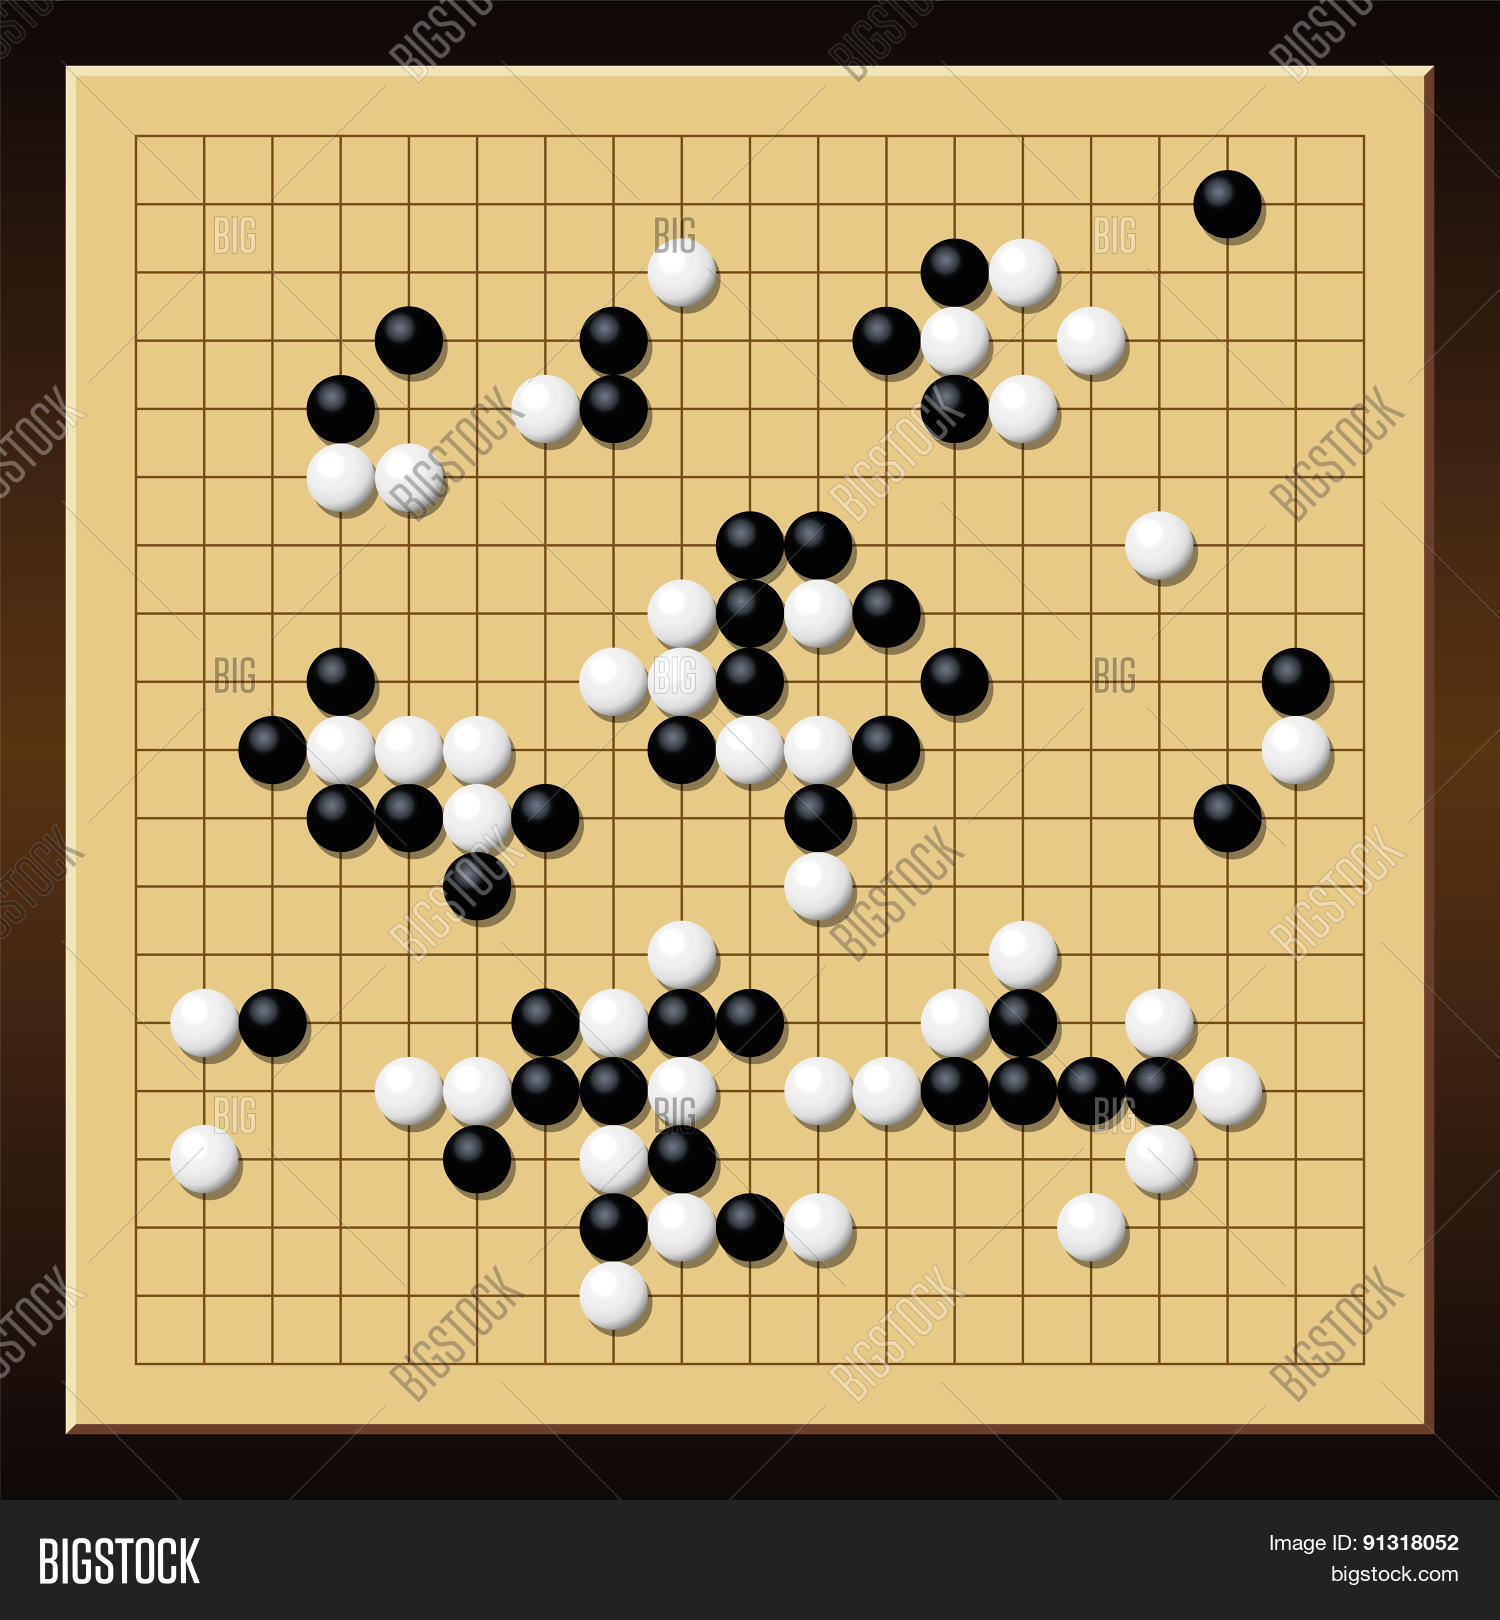 Go Game Gobang Gomoku Chinese Board